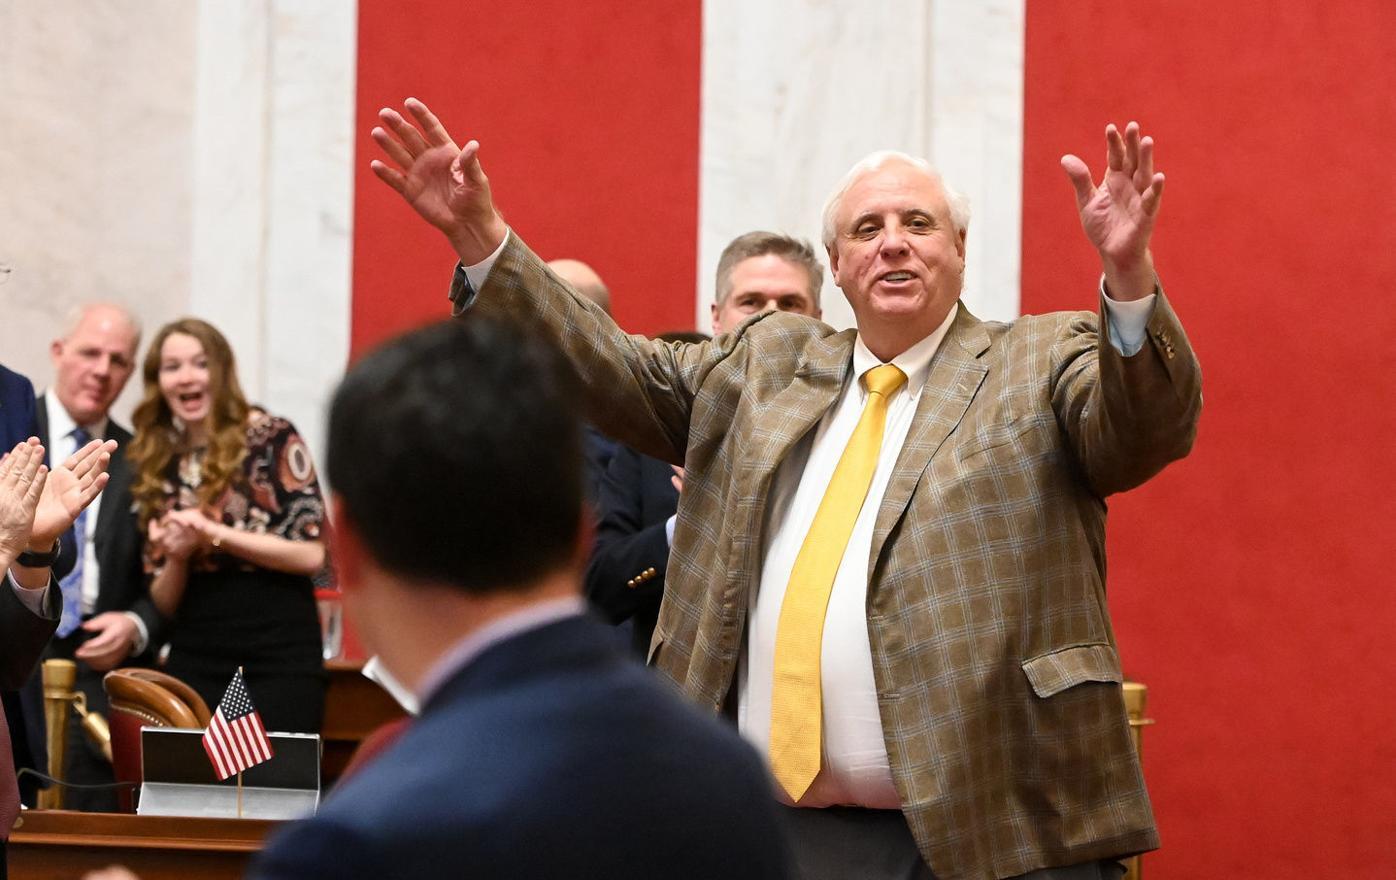 Justice in the Senate